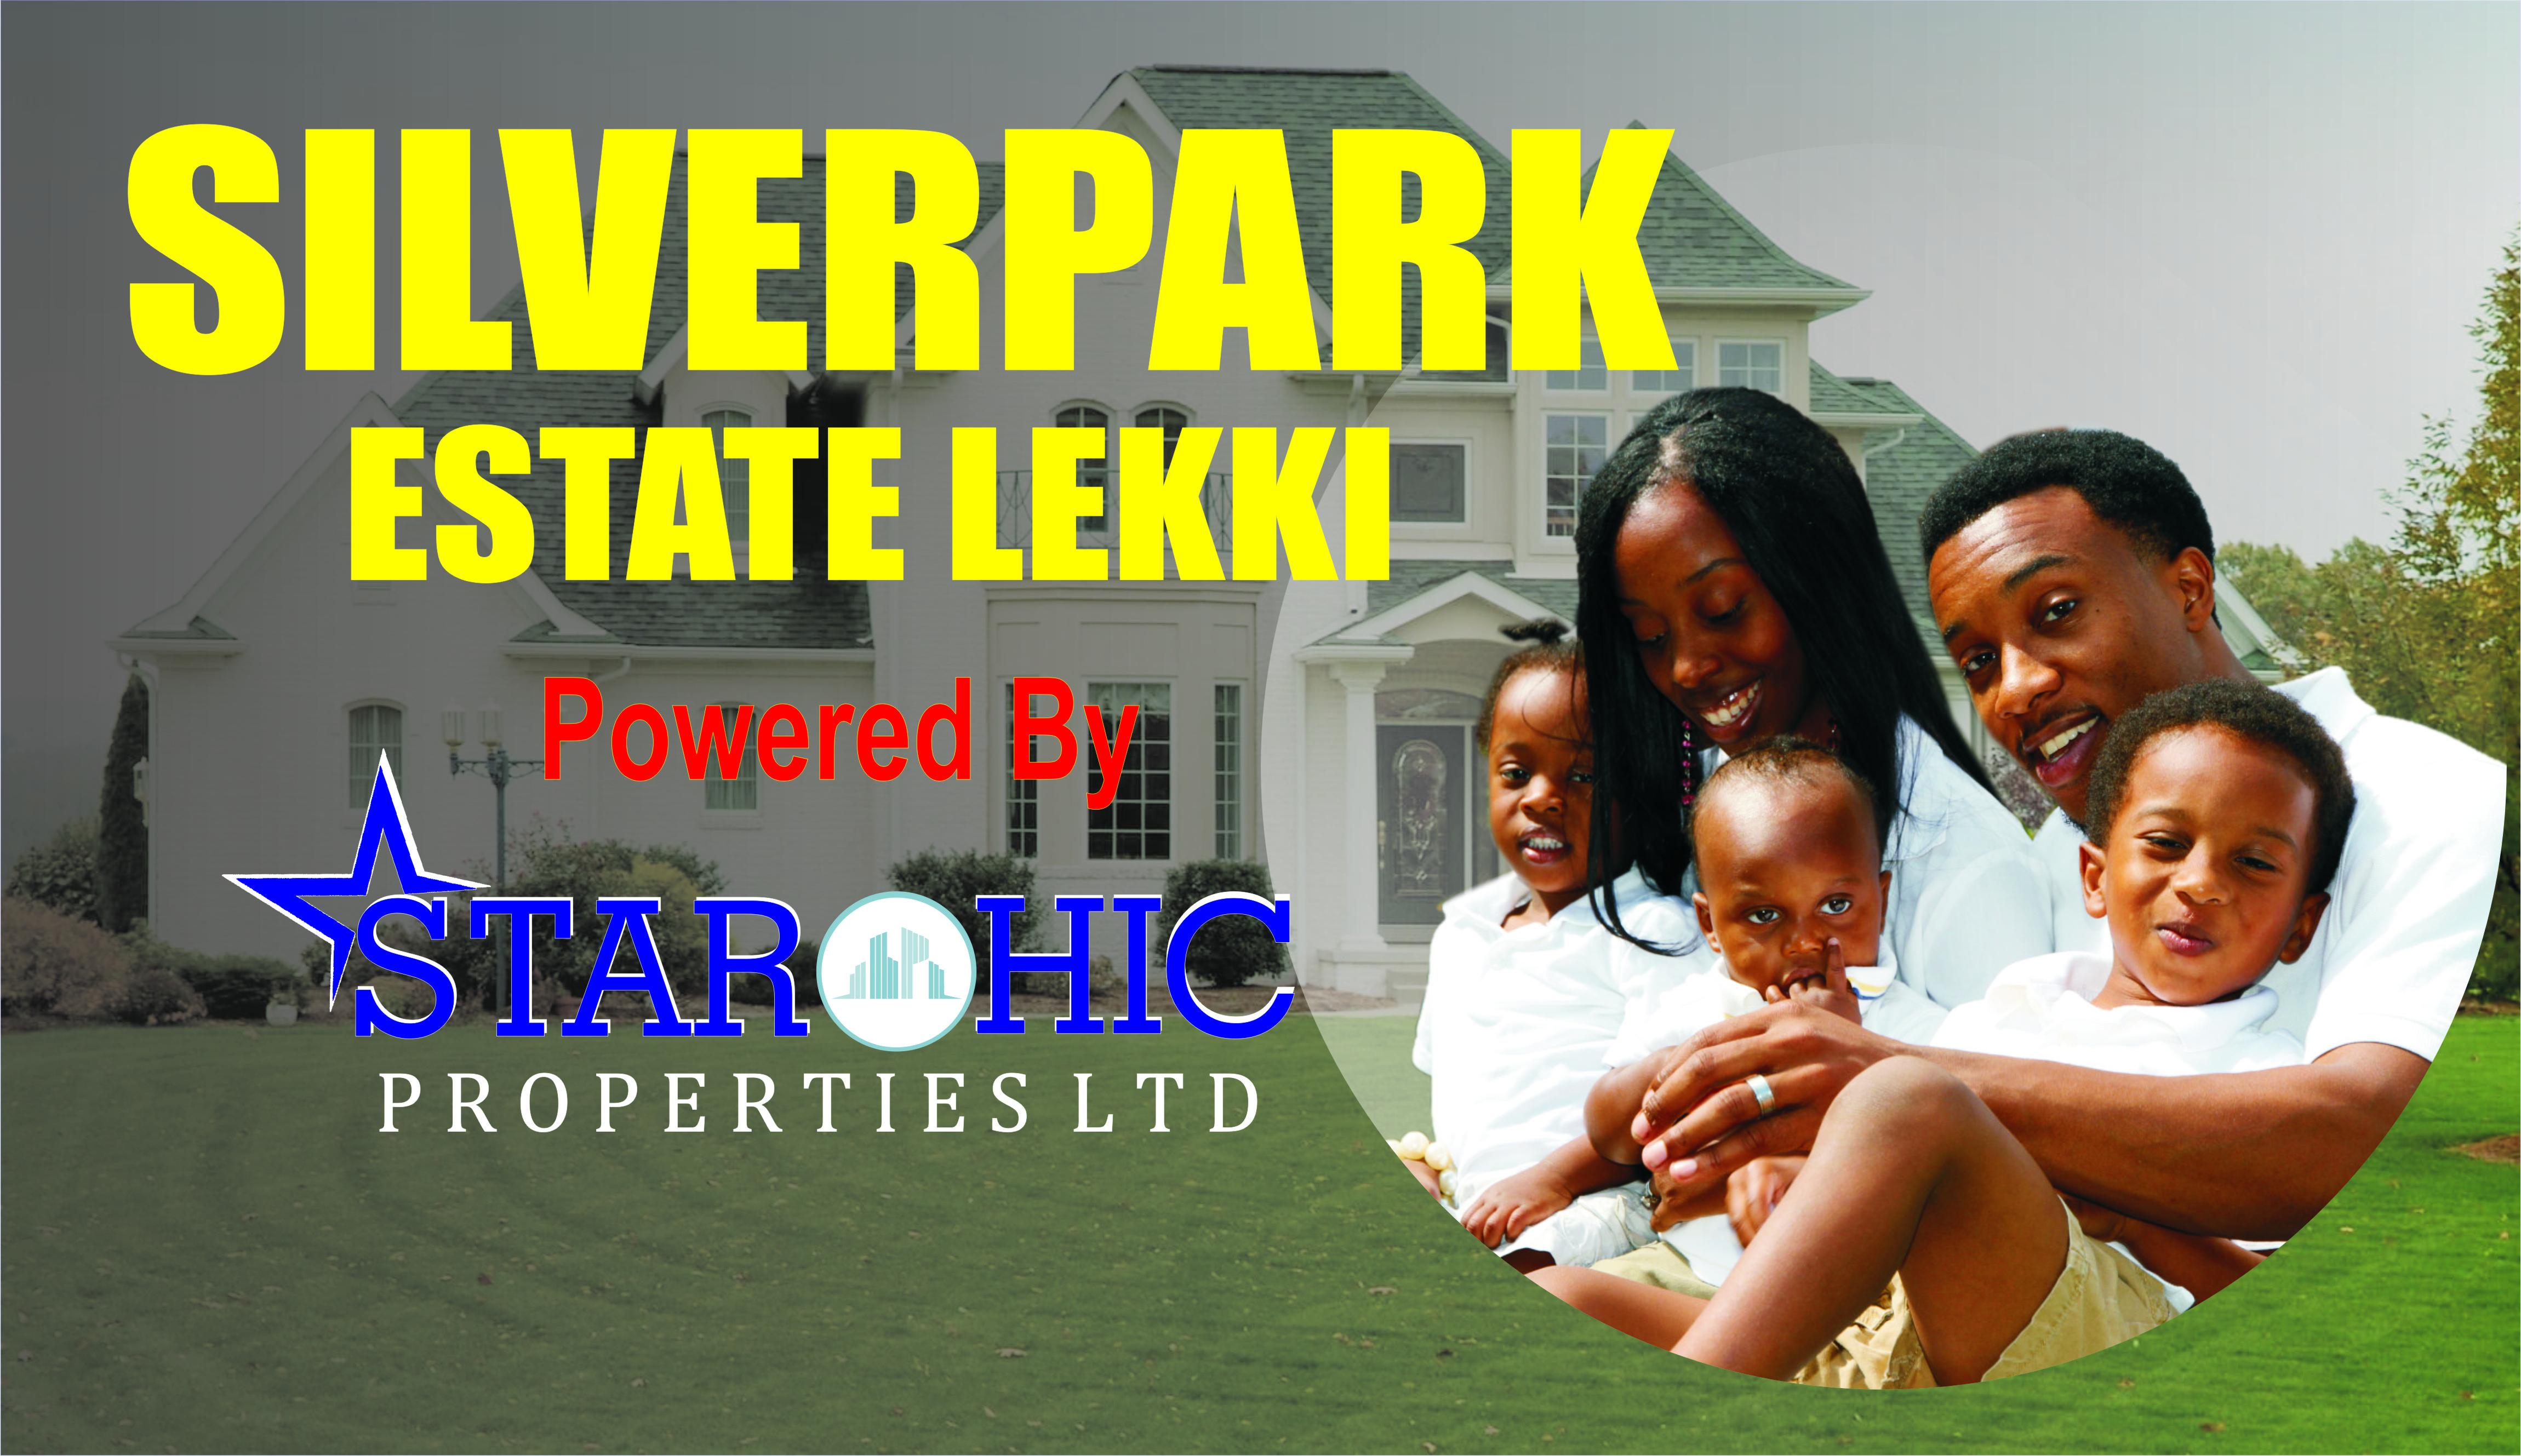 SilverPark Estate Lekki